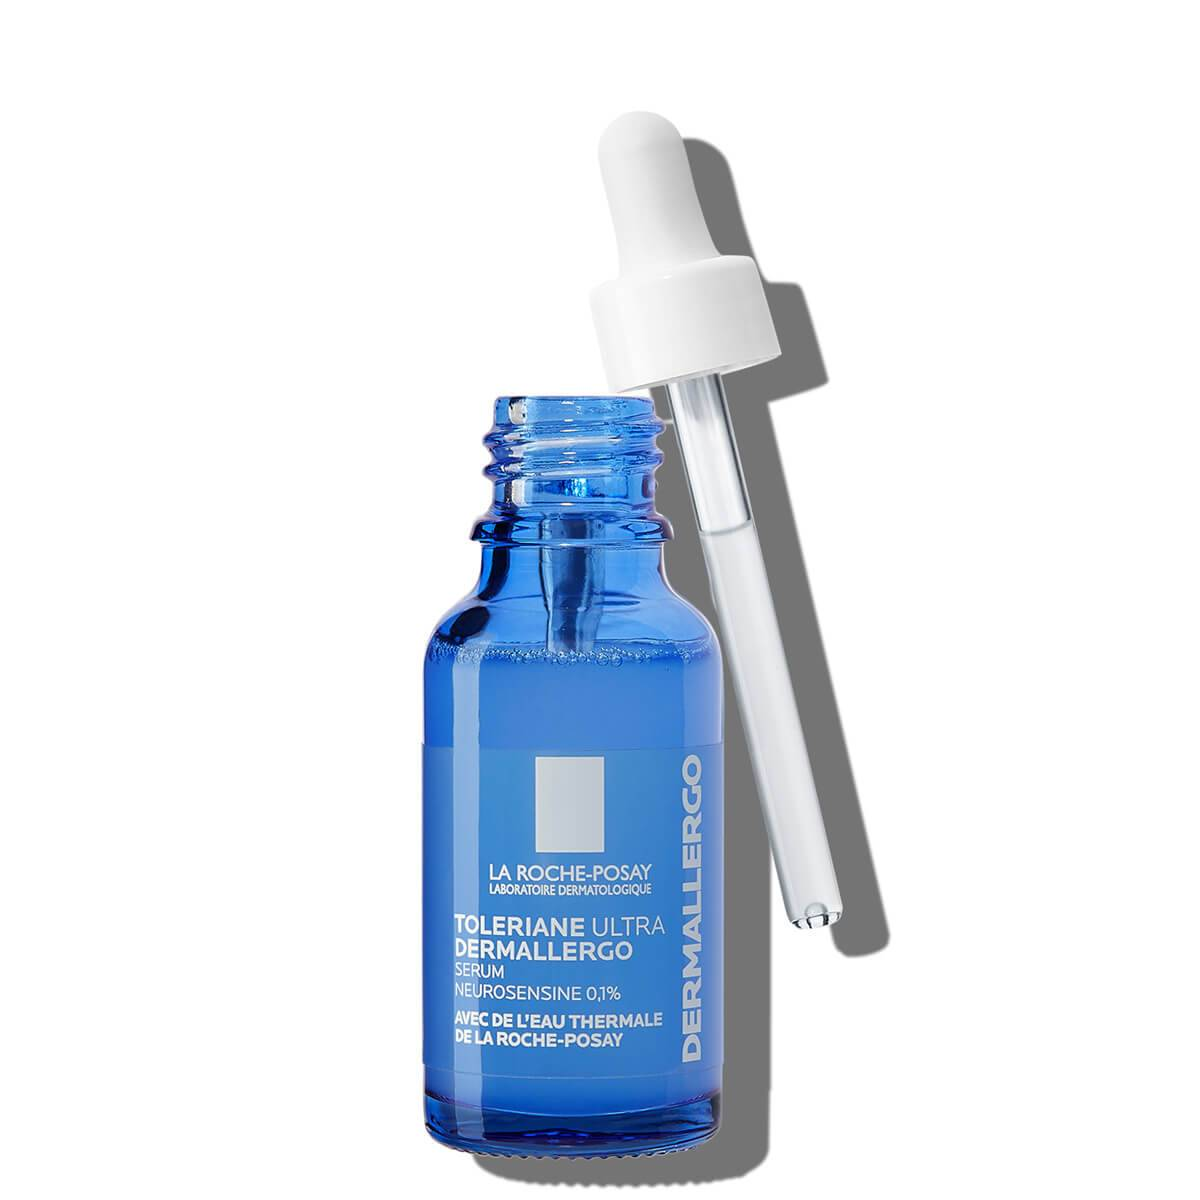 LaRochePosay-Product-Allergic-Toleriane-UltraDermallergo-20ml-3337875693820-OpenSS-1